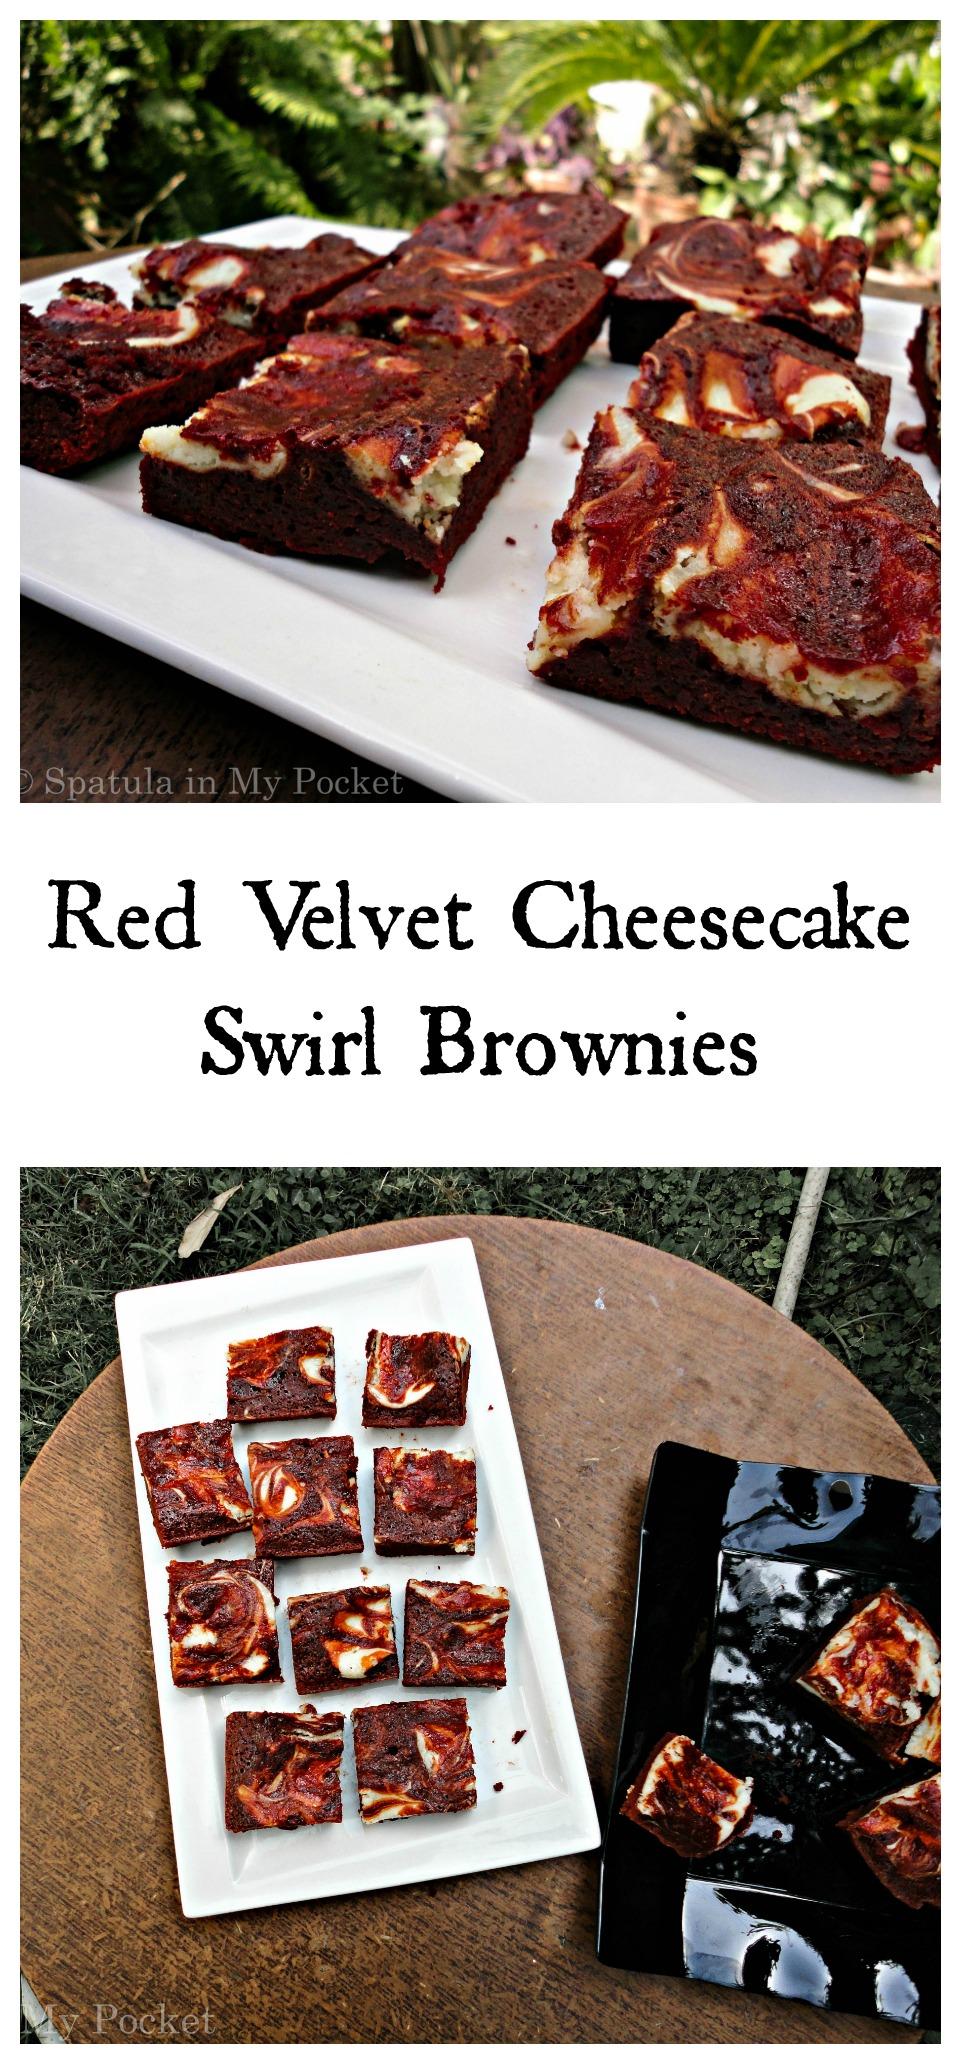 Red Velvet Cheesecake Swirl Brownies | Spatula in My Pocket